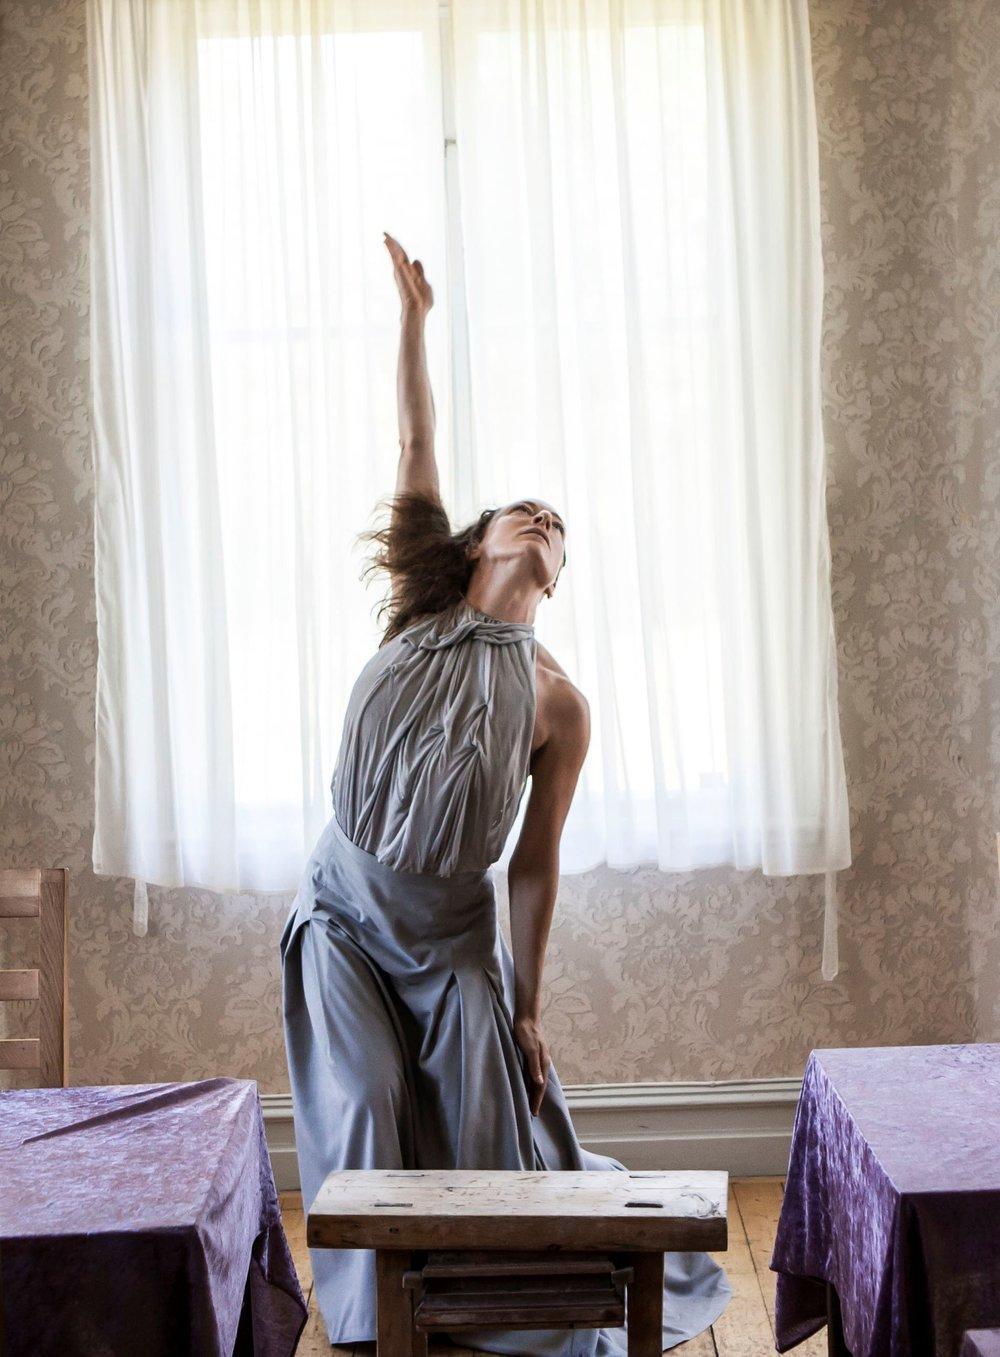 Dansaren Elin Kristoffersson uppträder med solodans på Midvinterglöd 10 december 2016